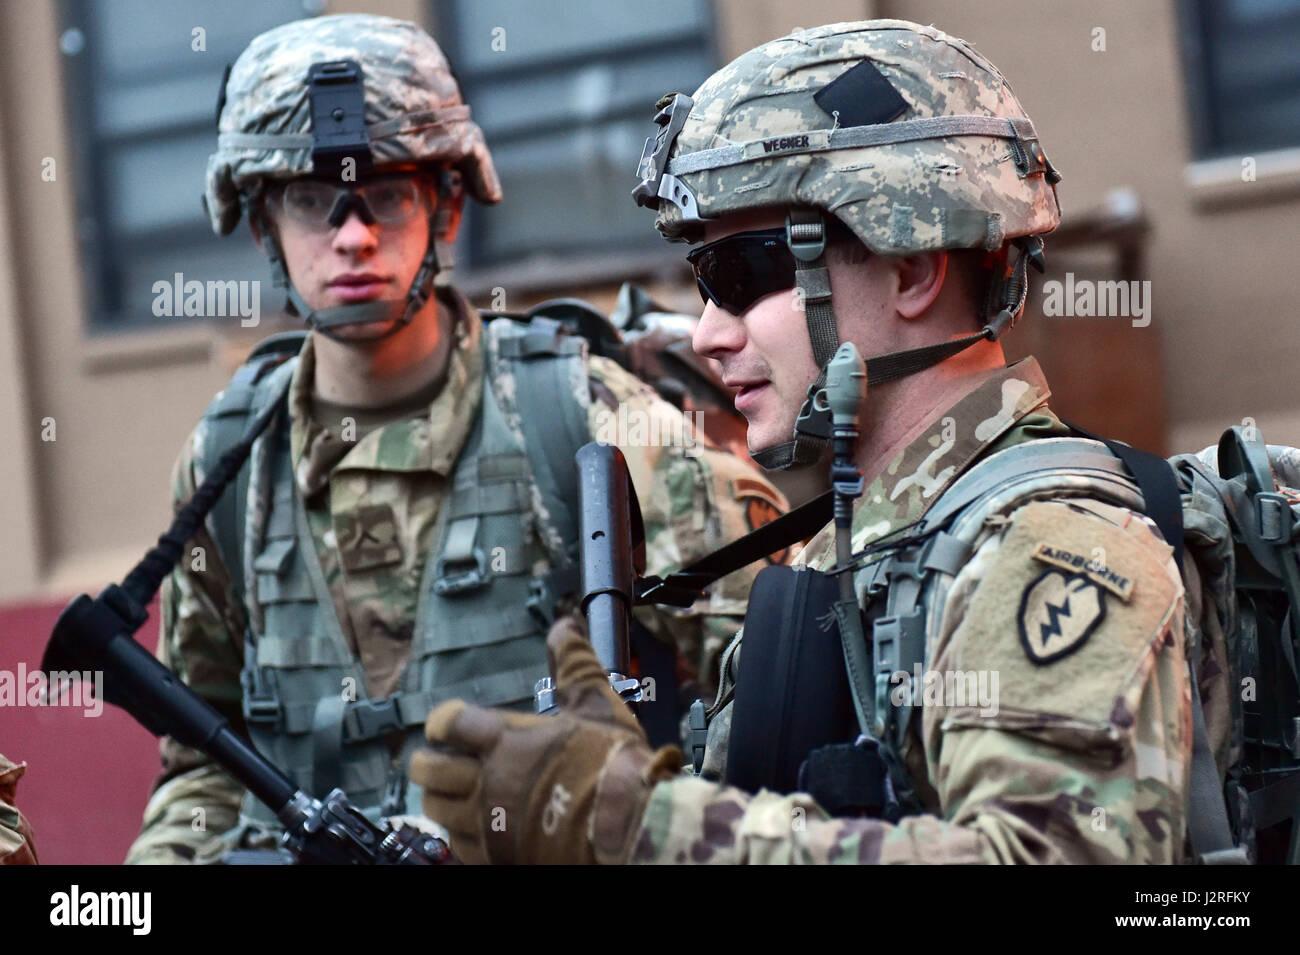 U S Forc Stockfotos & U S Forc Bilder - Seite 2 - Alamy